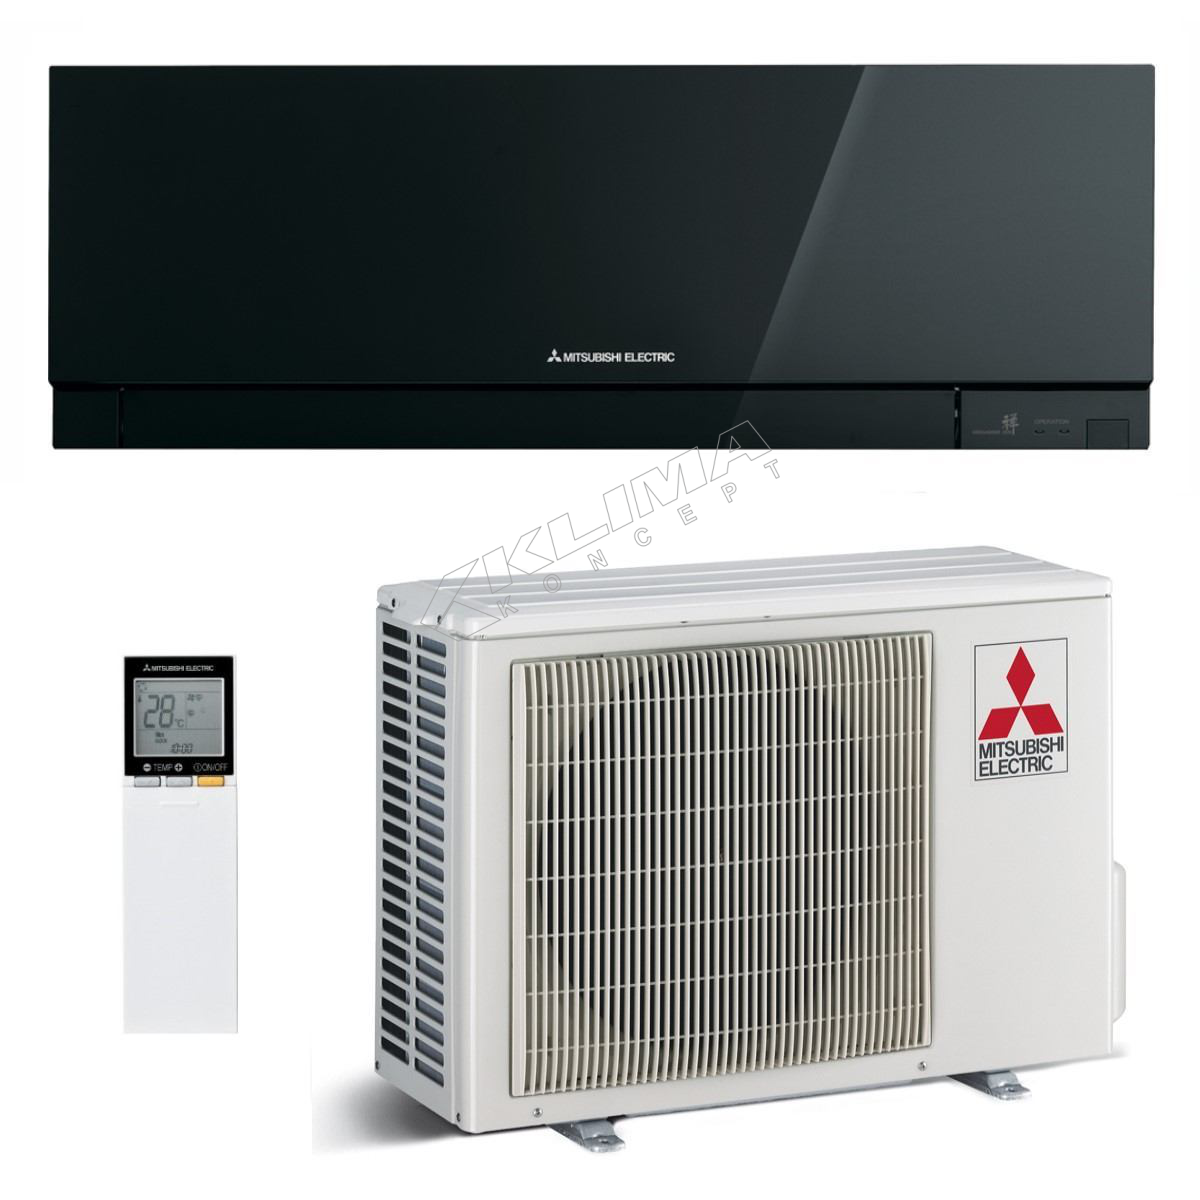 MITSUBISHI ELECTRIC KLIMA UREĐAJ MSZ-EF42VGB/MUZ-EF42VG R32